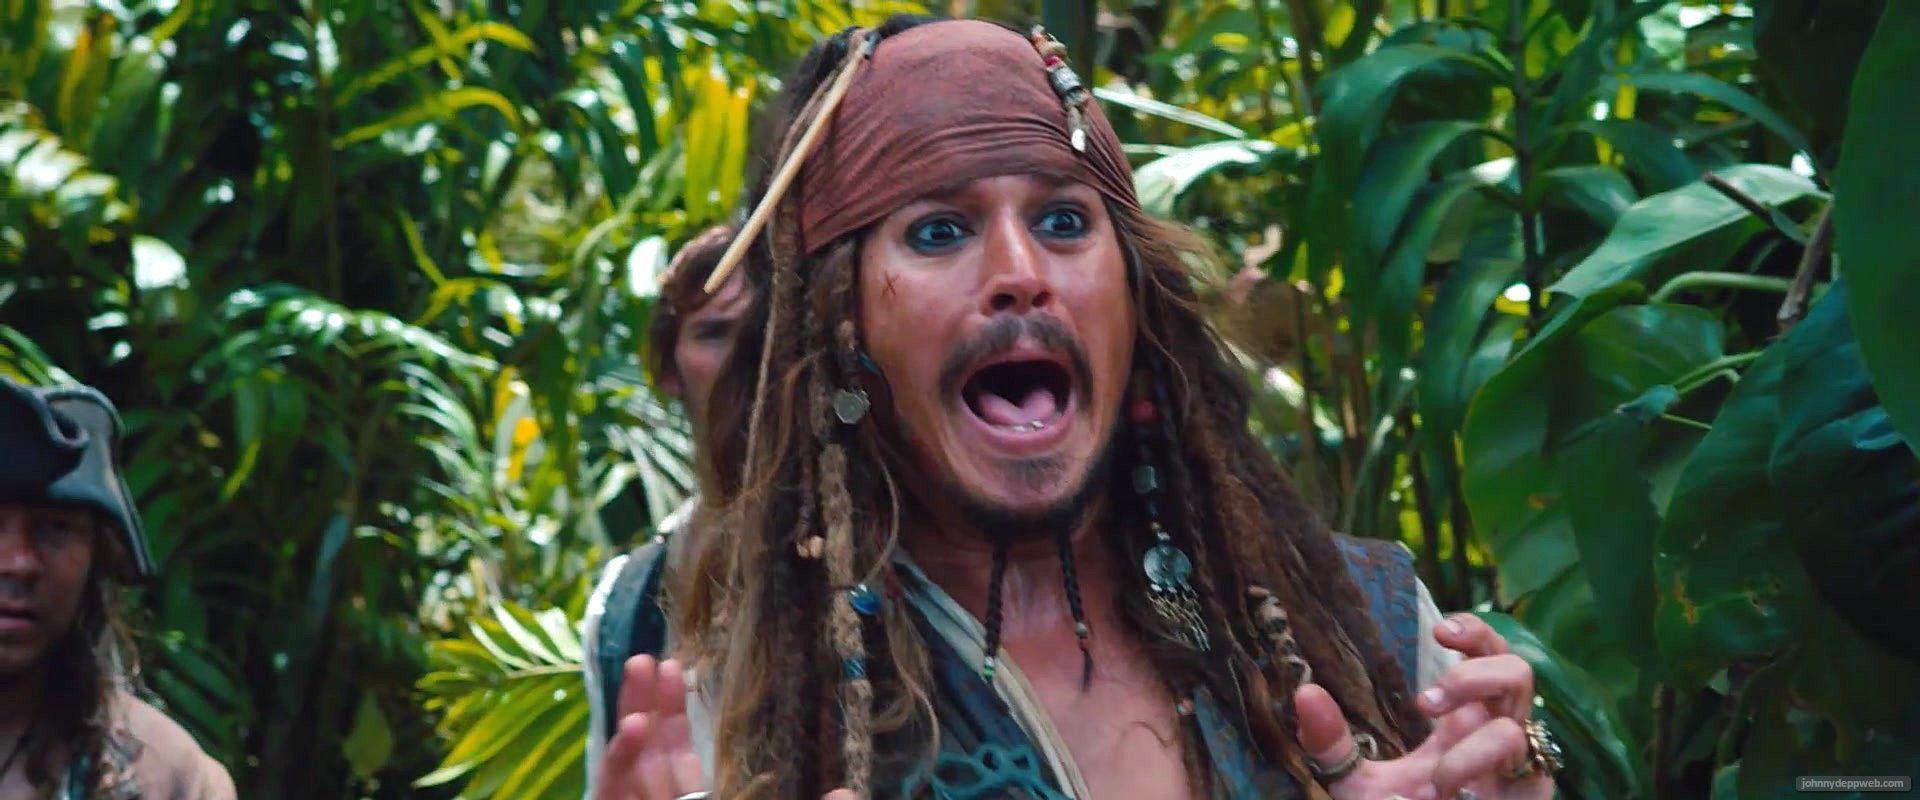 POTC 4 trailer Jack Sparrow - Pirates of the Caribbean 4 Image ... Potc